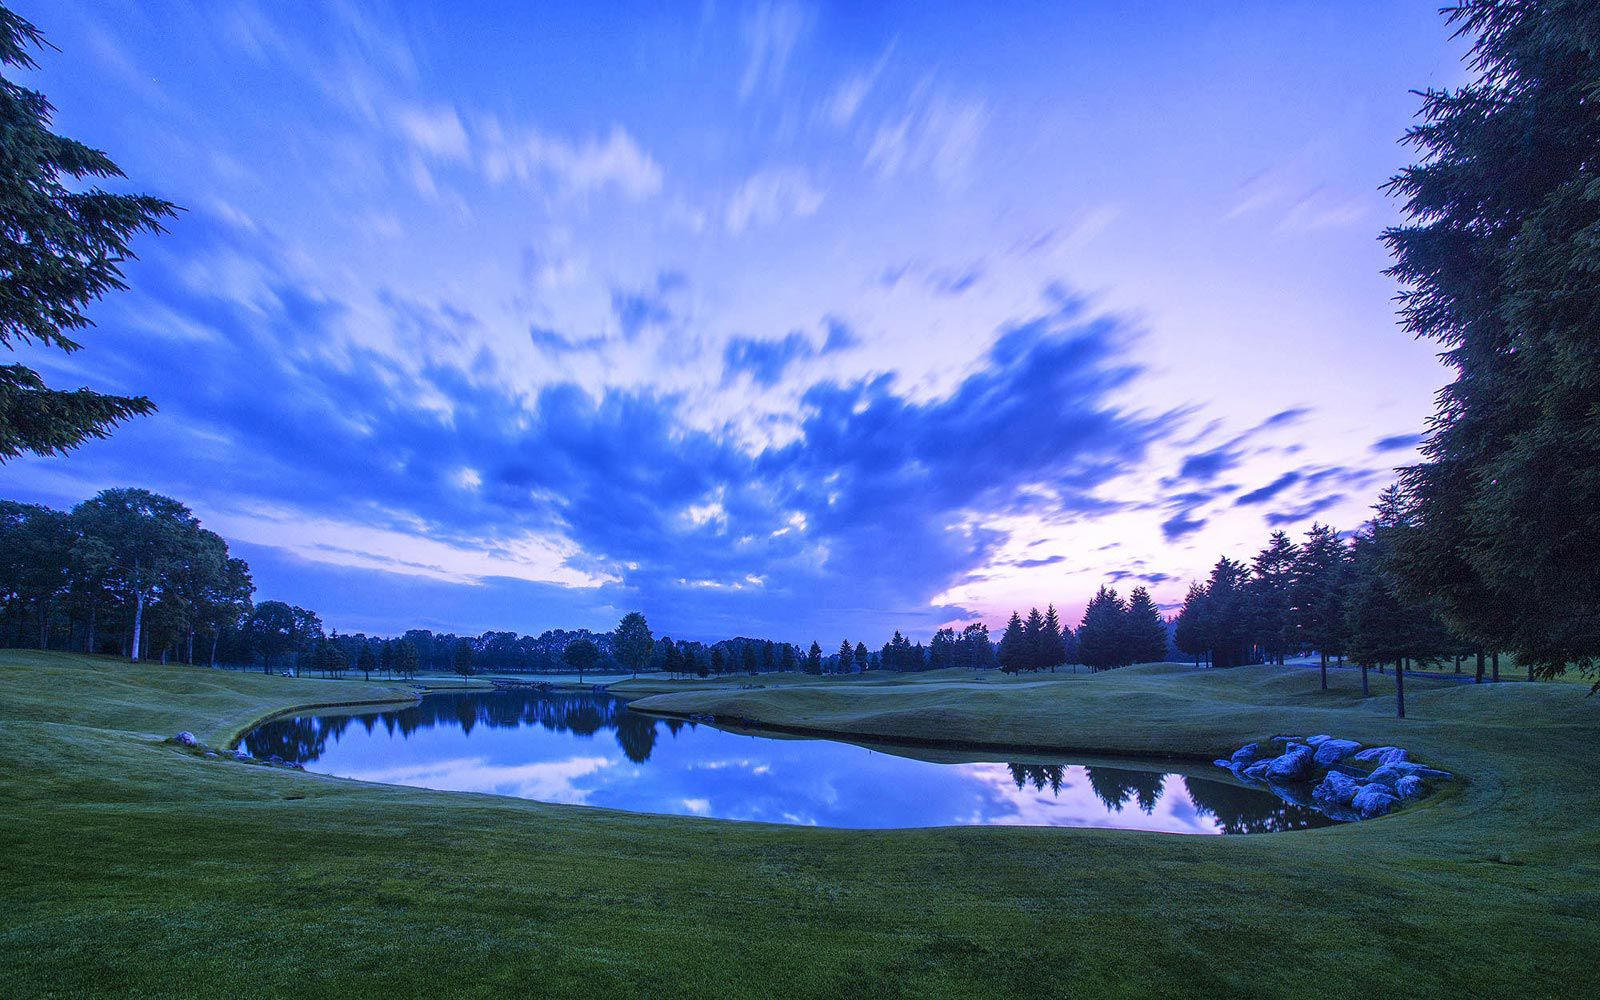 hokkaido_classic_golf_club_cover_picture